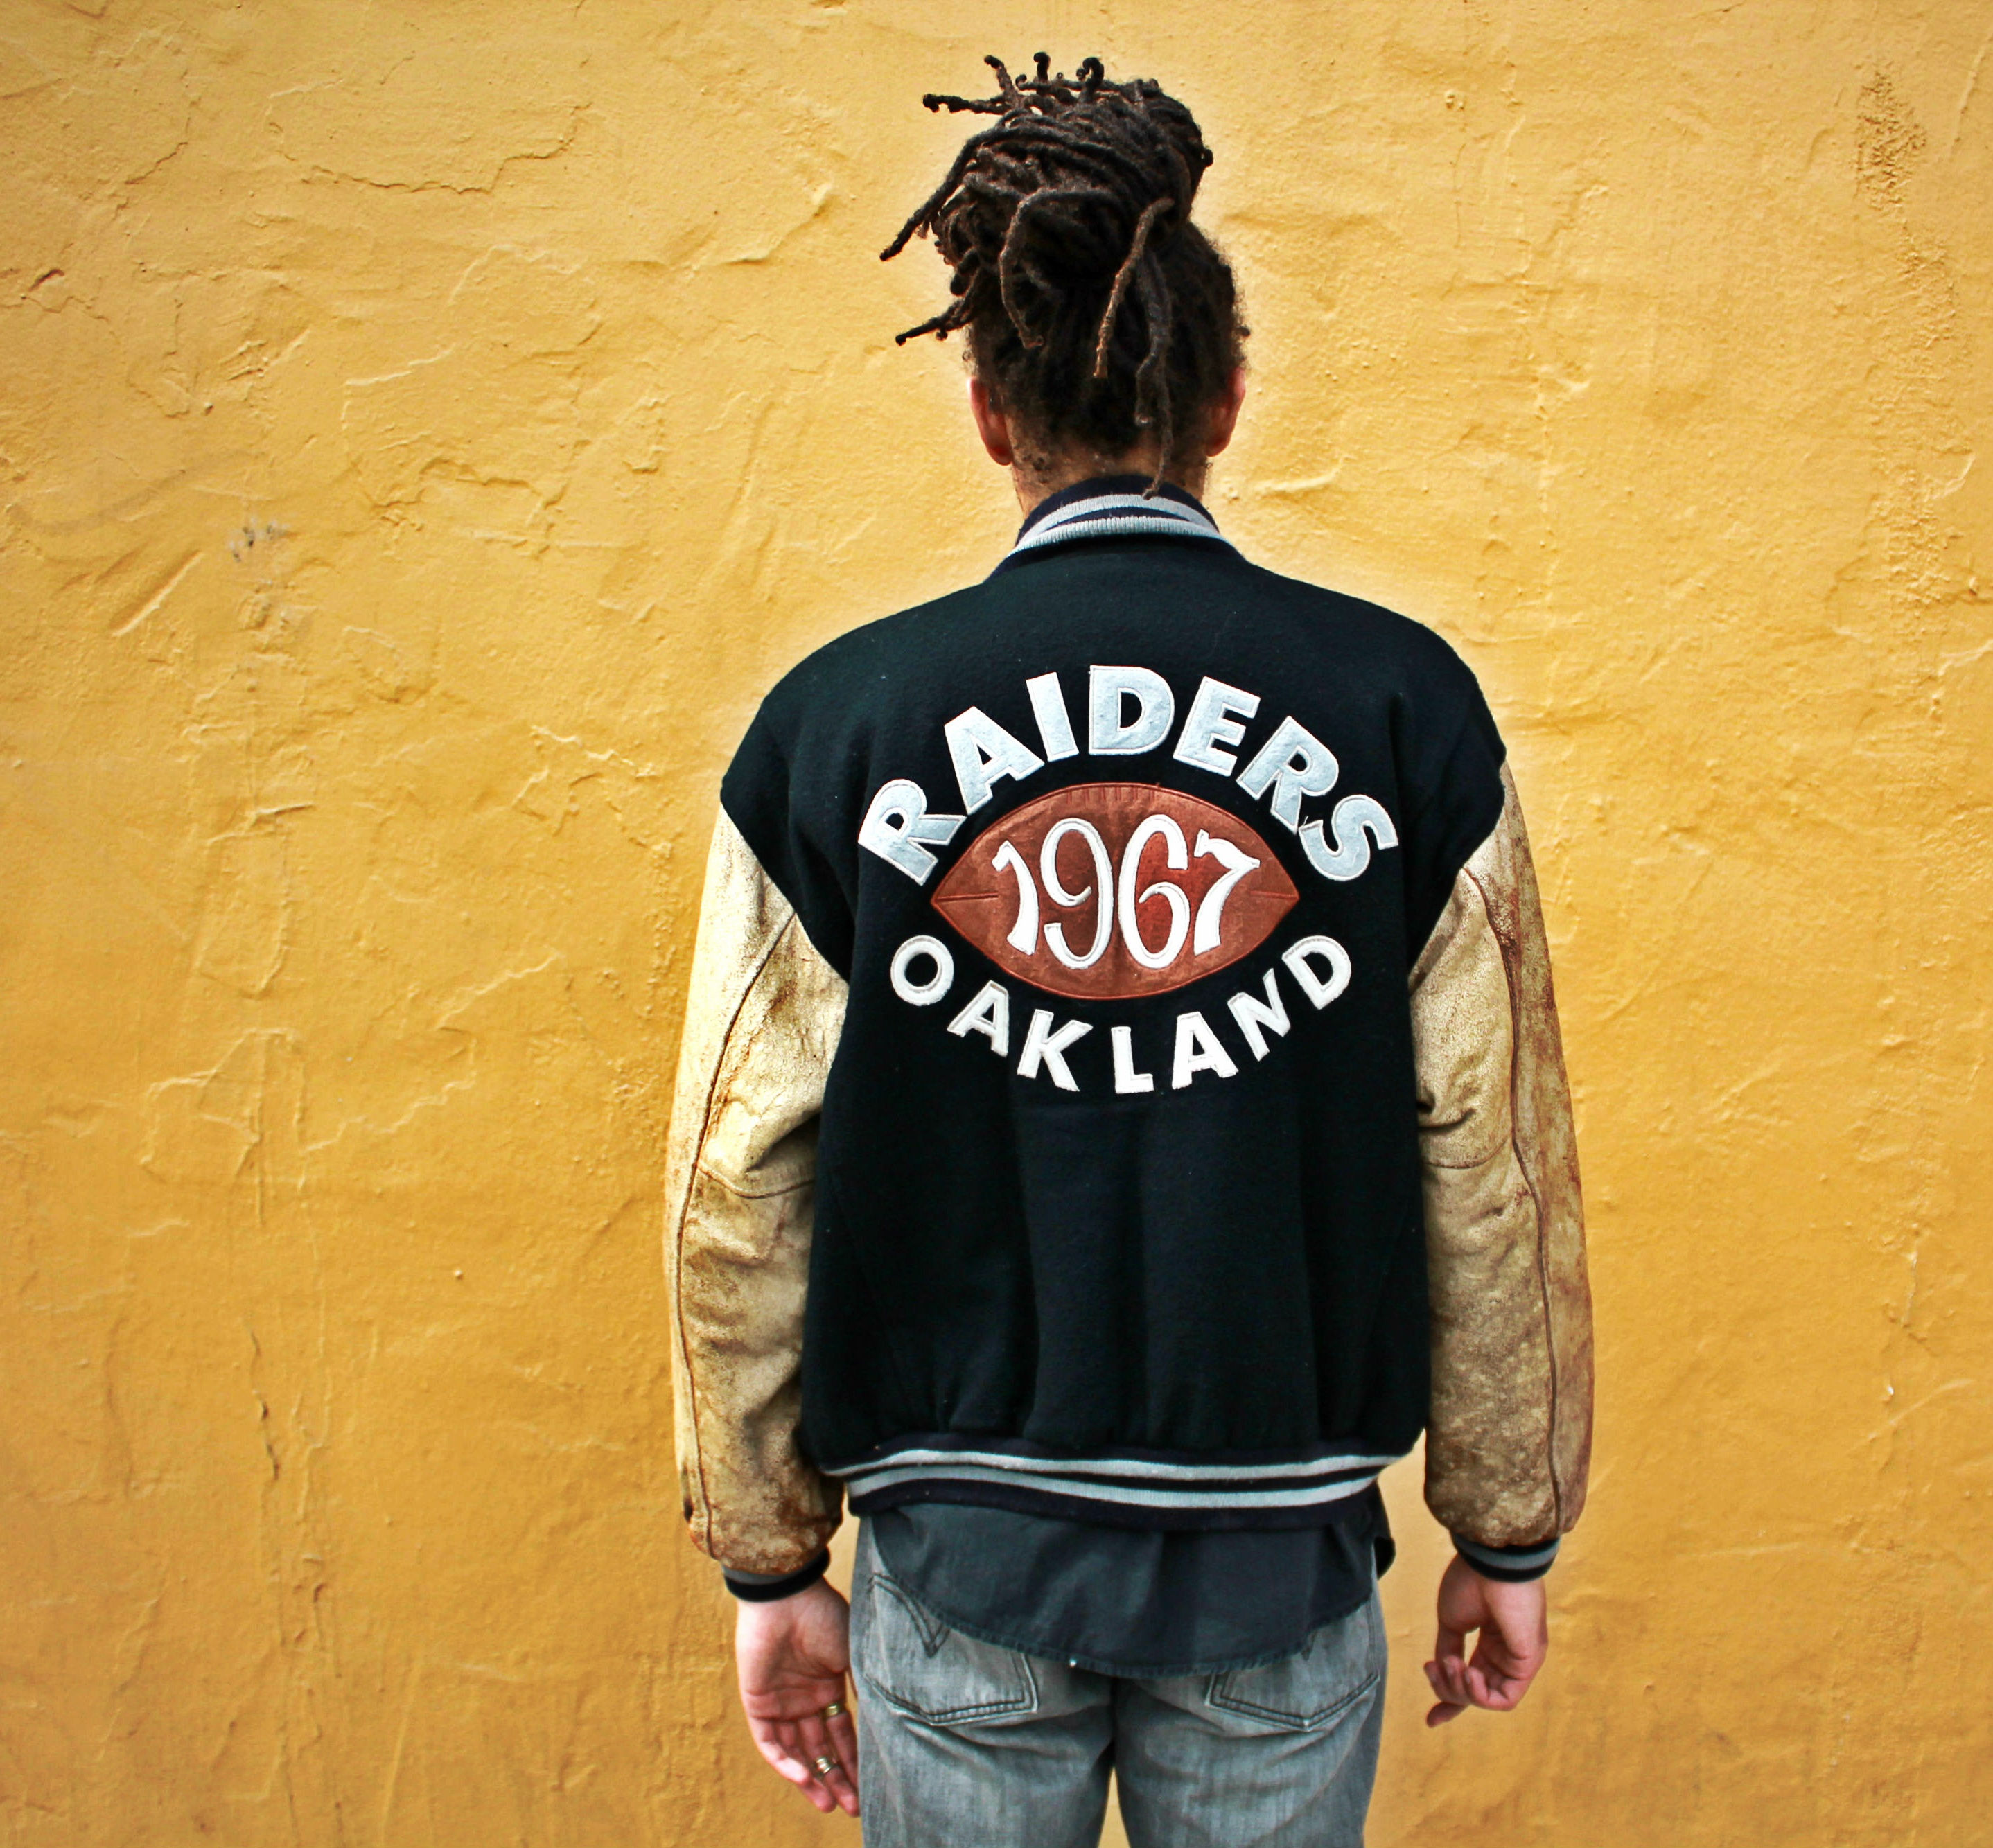 Vintage 1967 Oakland Raiders Letterman Jacket on Storenvy